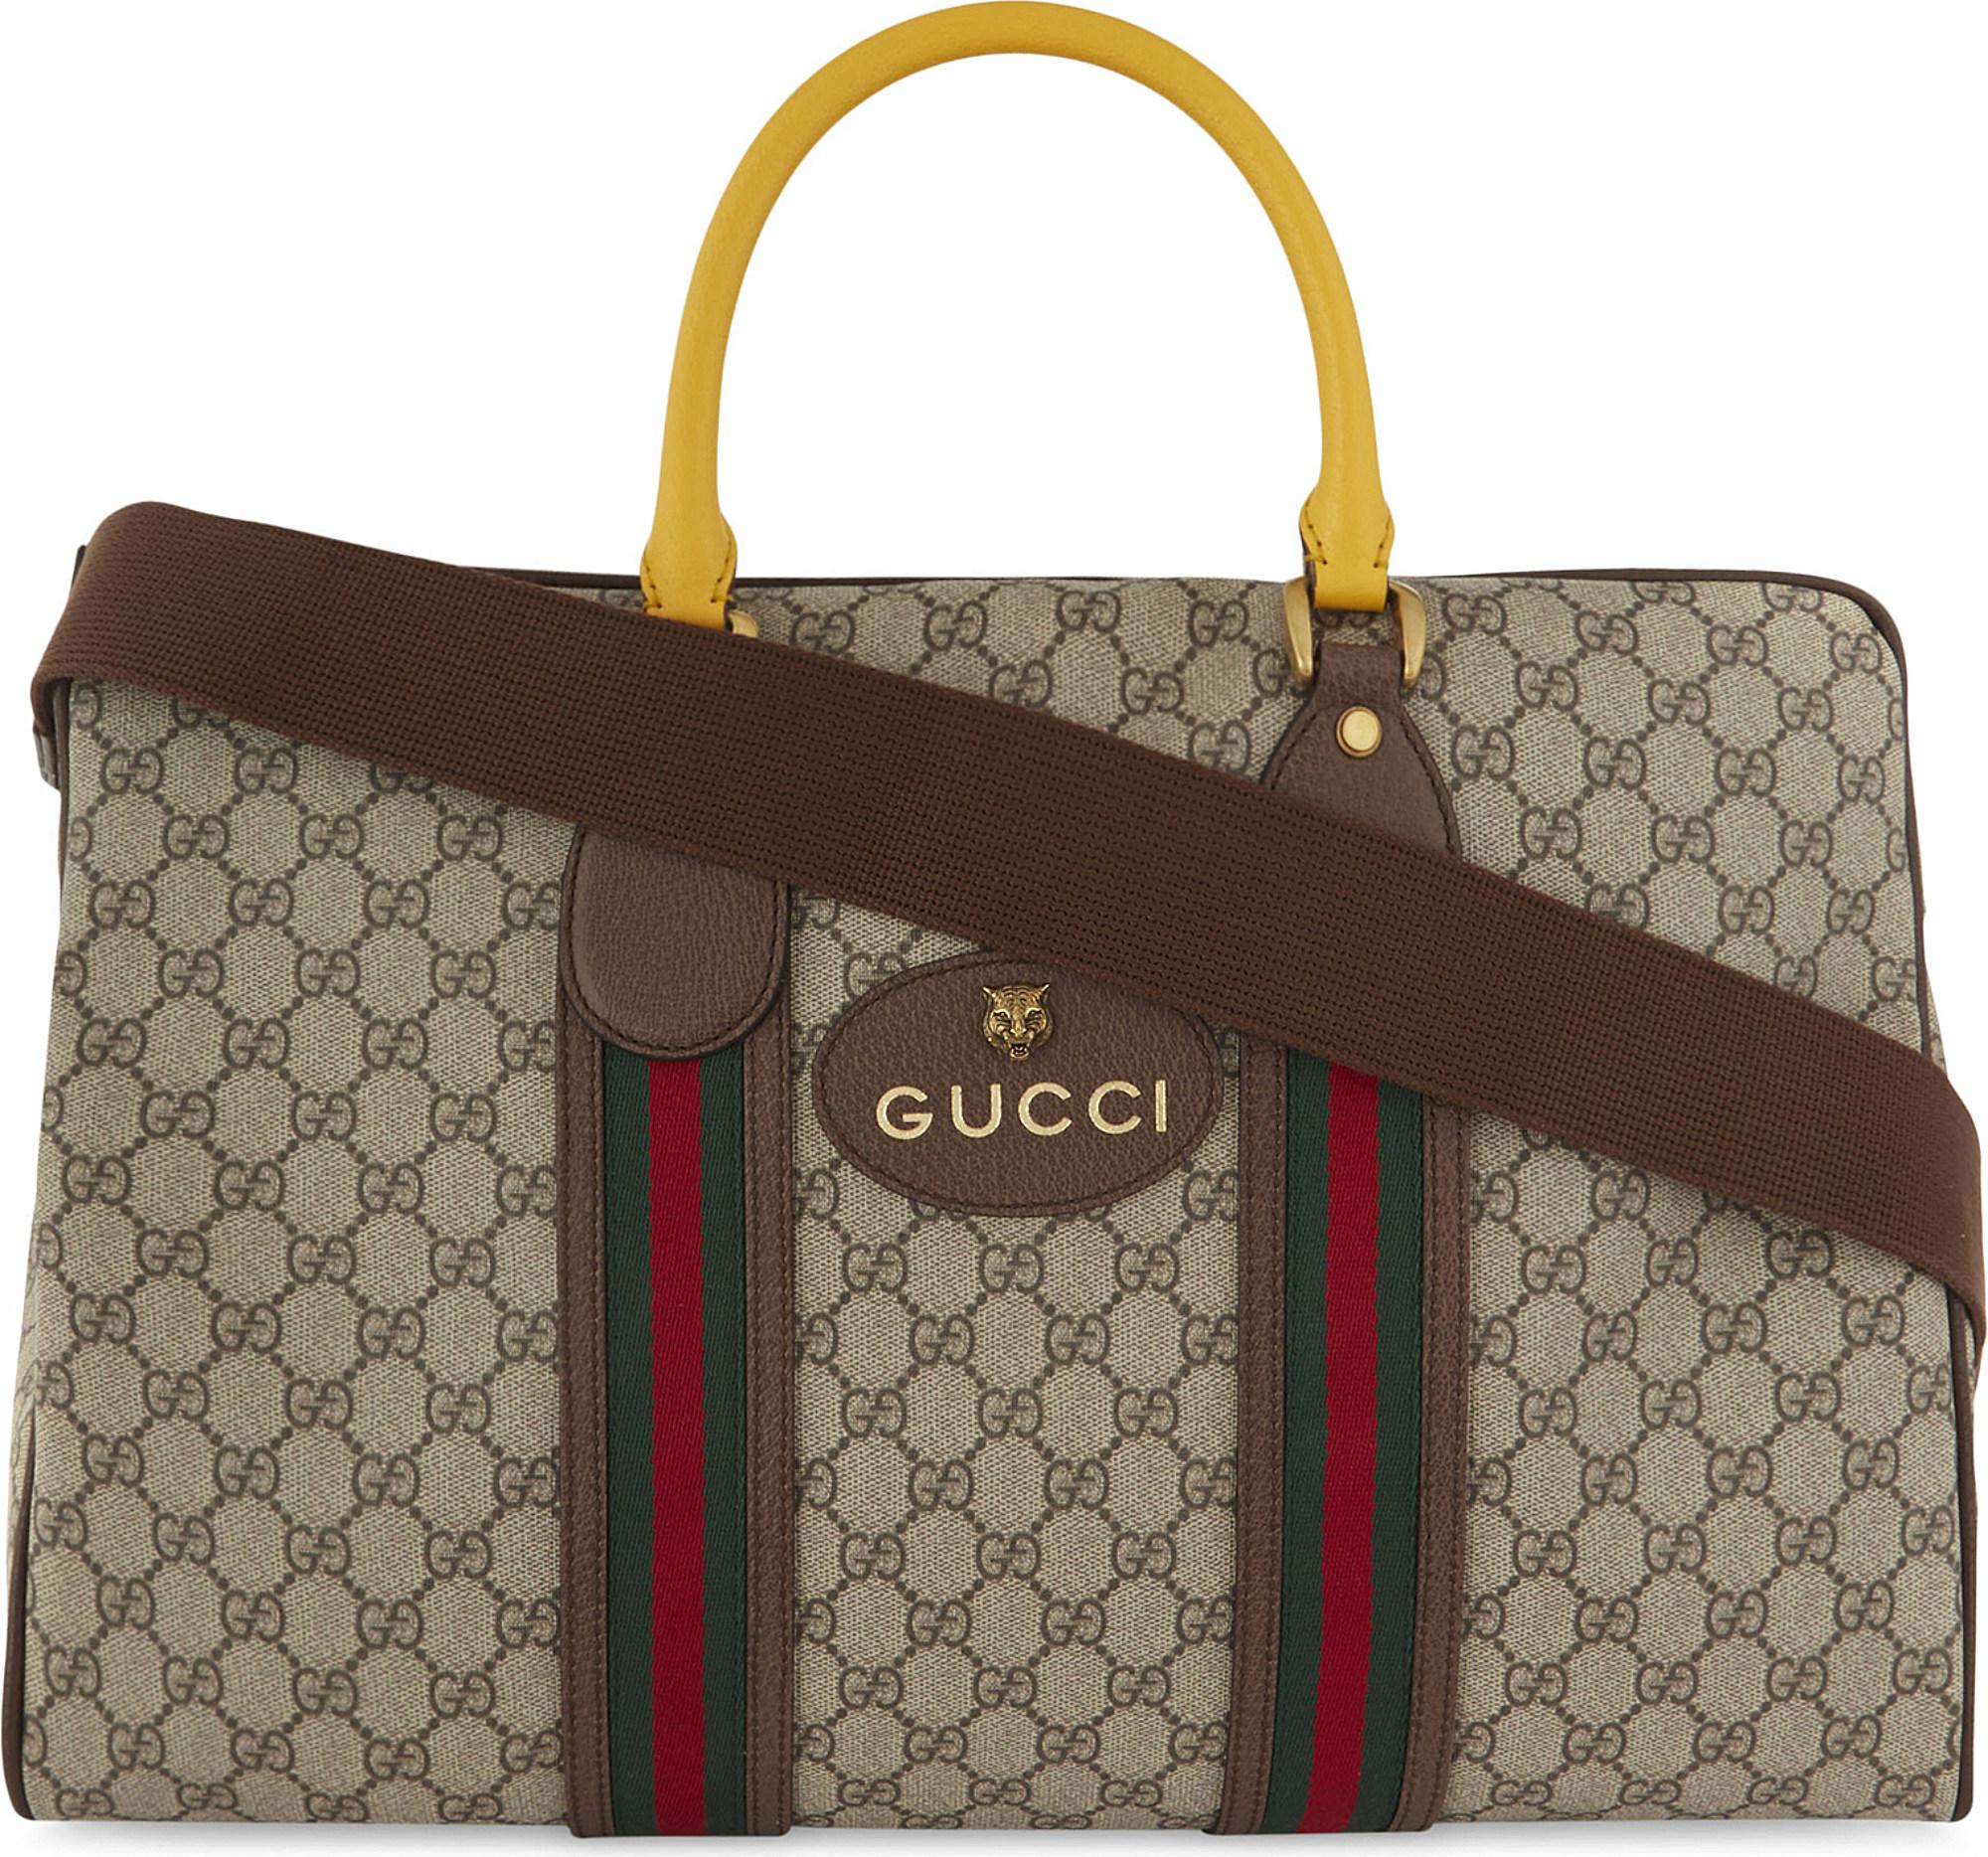 1c317e8fe Gucci Vintage Supreme Canvas Duffel Bag in Brown for Men - Lyst